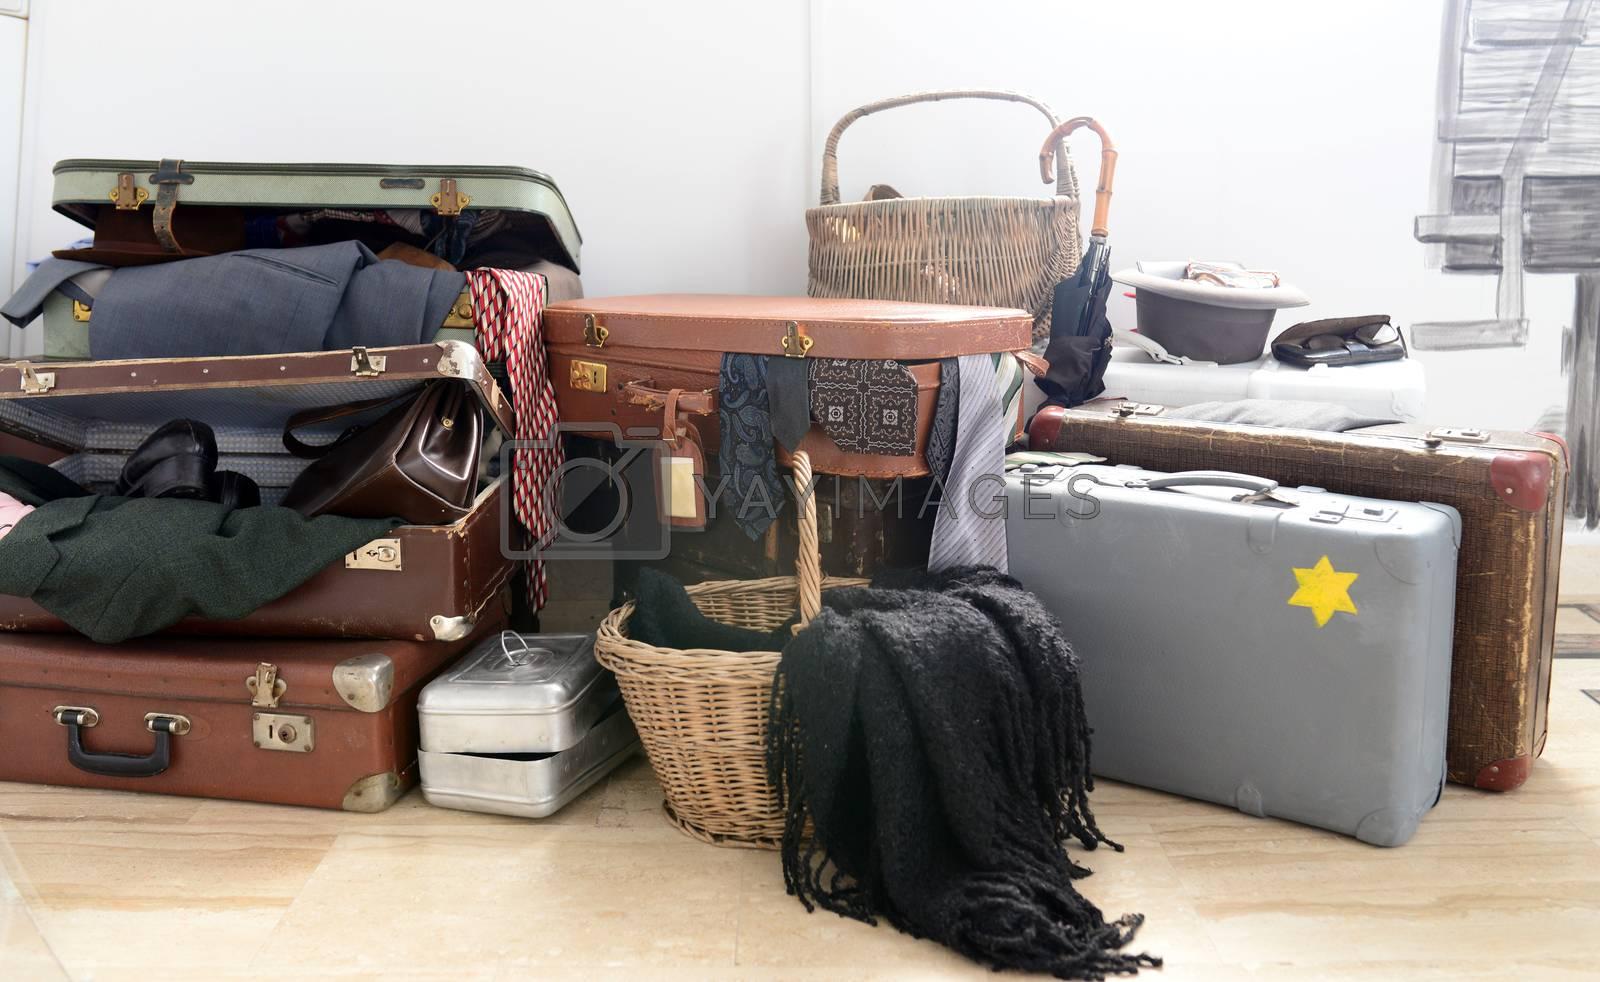 Royalty free image of jewish luggage by tony4urban